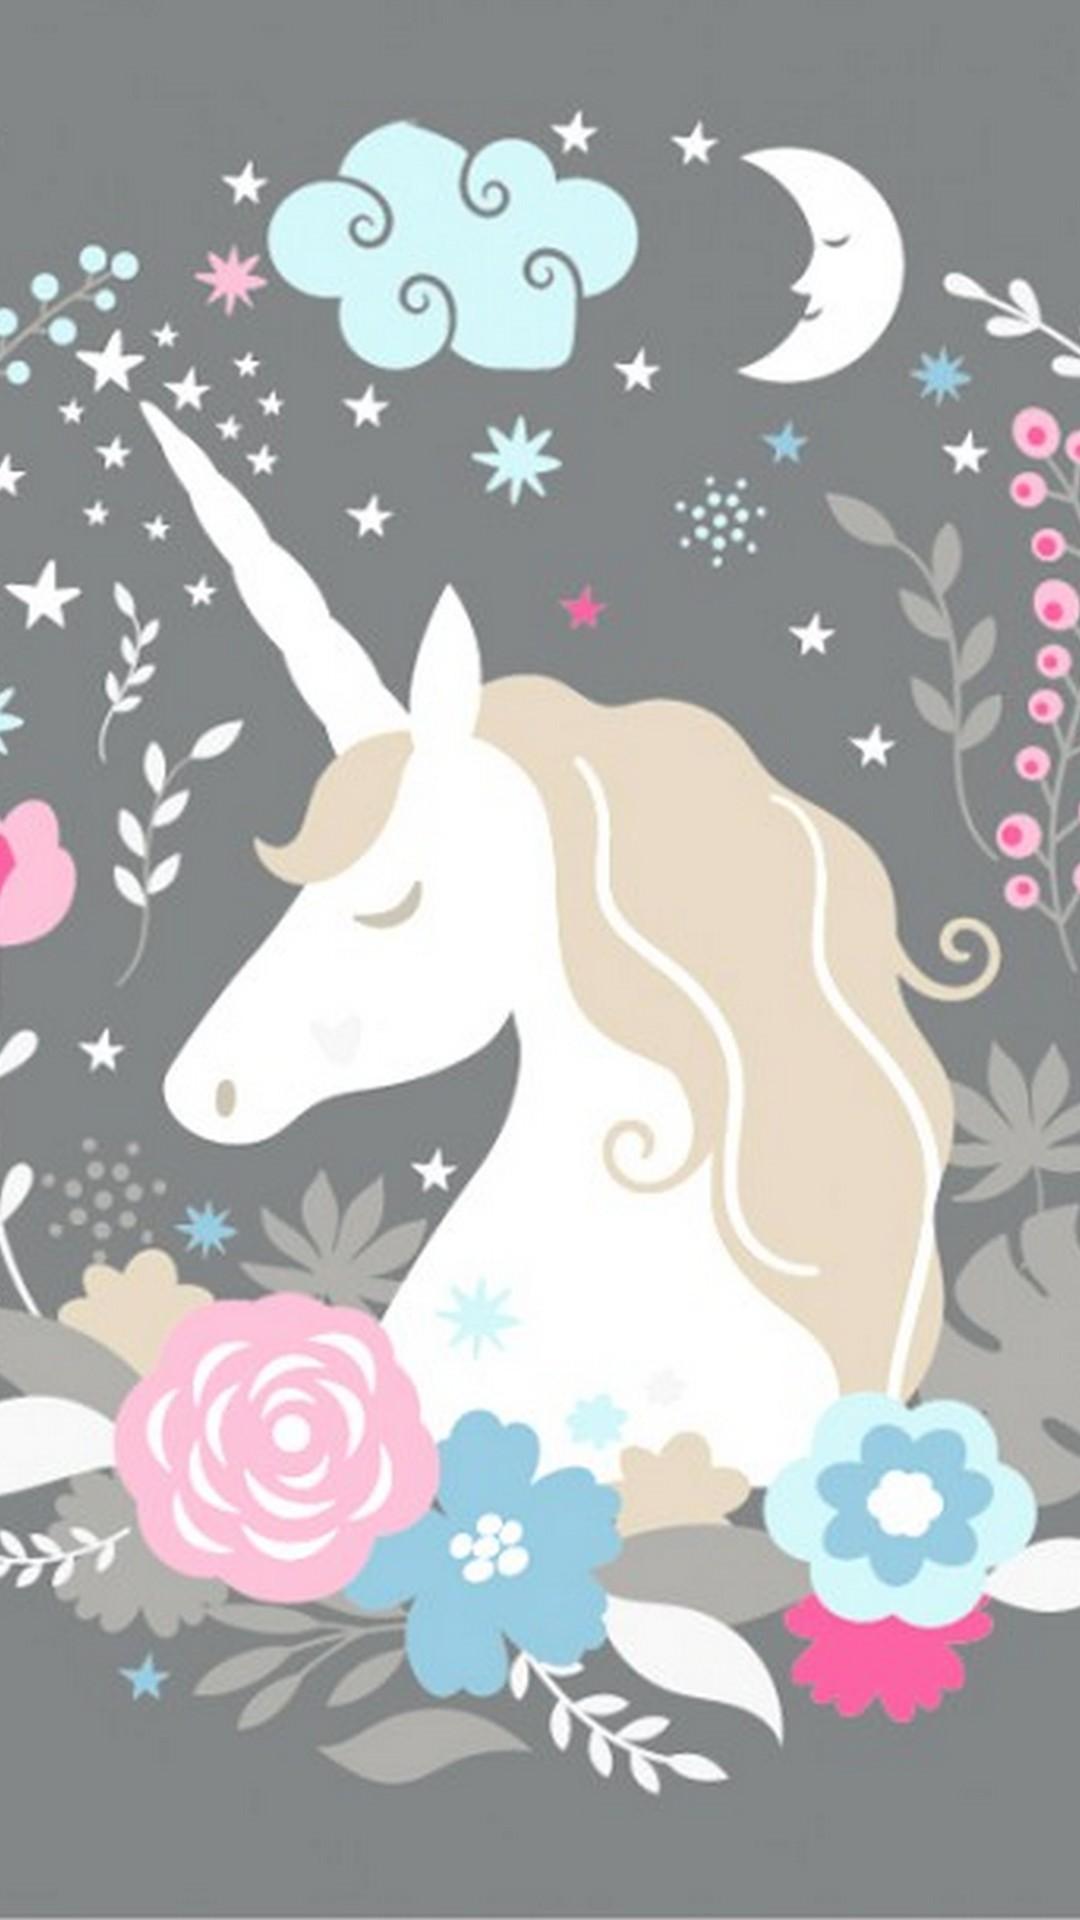 Cute Girly Unicorn Iphone 7 Wallpaper 2020 3d Iphone Wallpaper